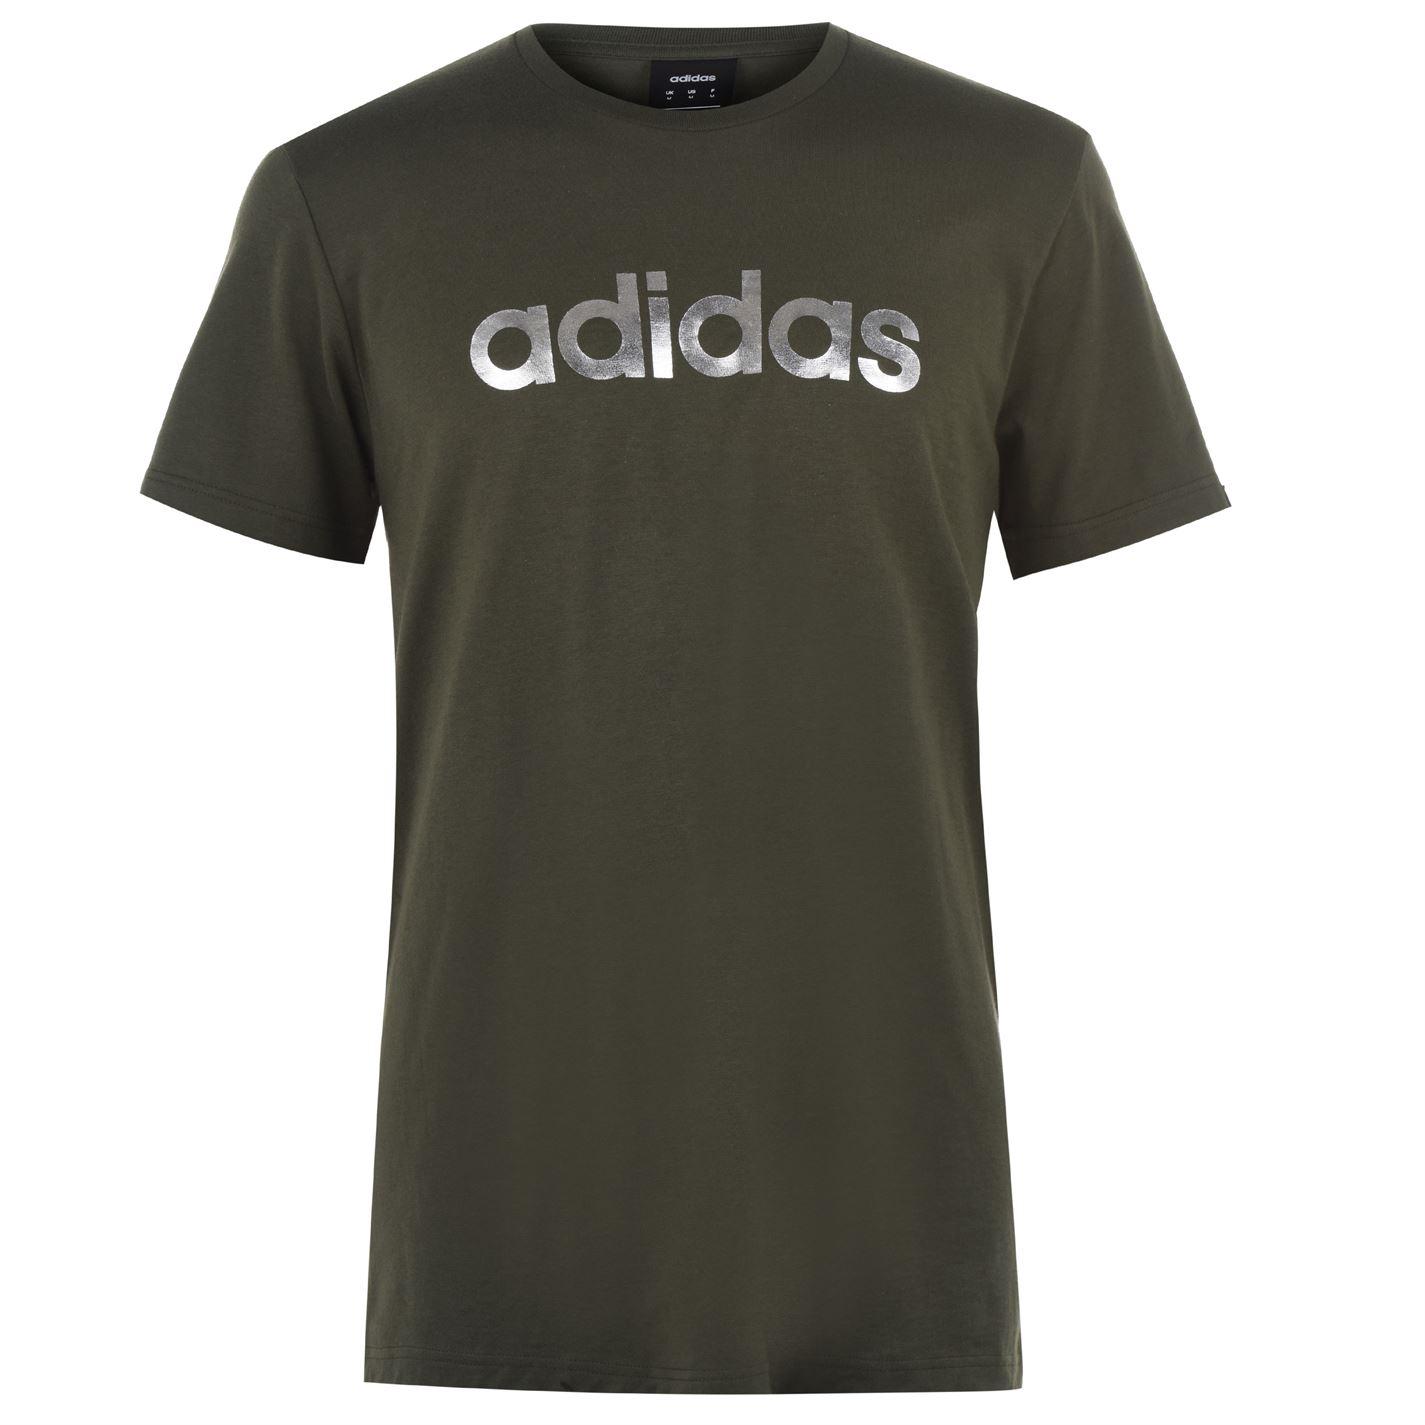 Adidas Mens Linear Foil T-Shirt